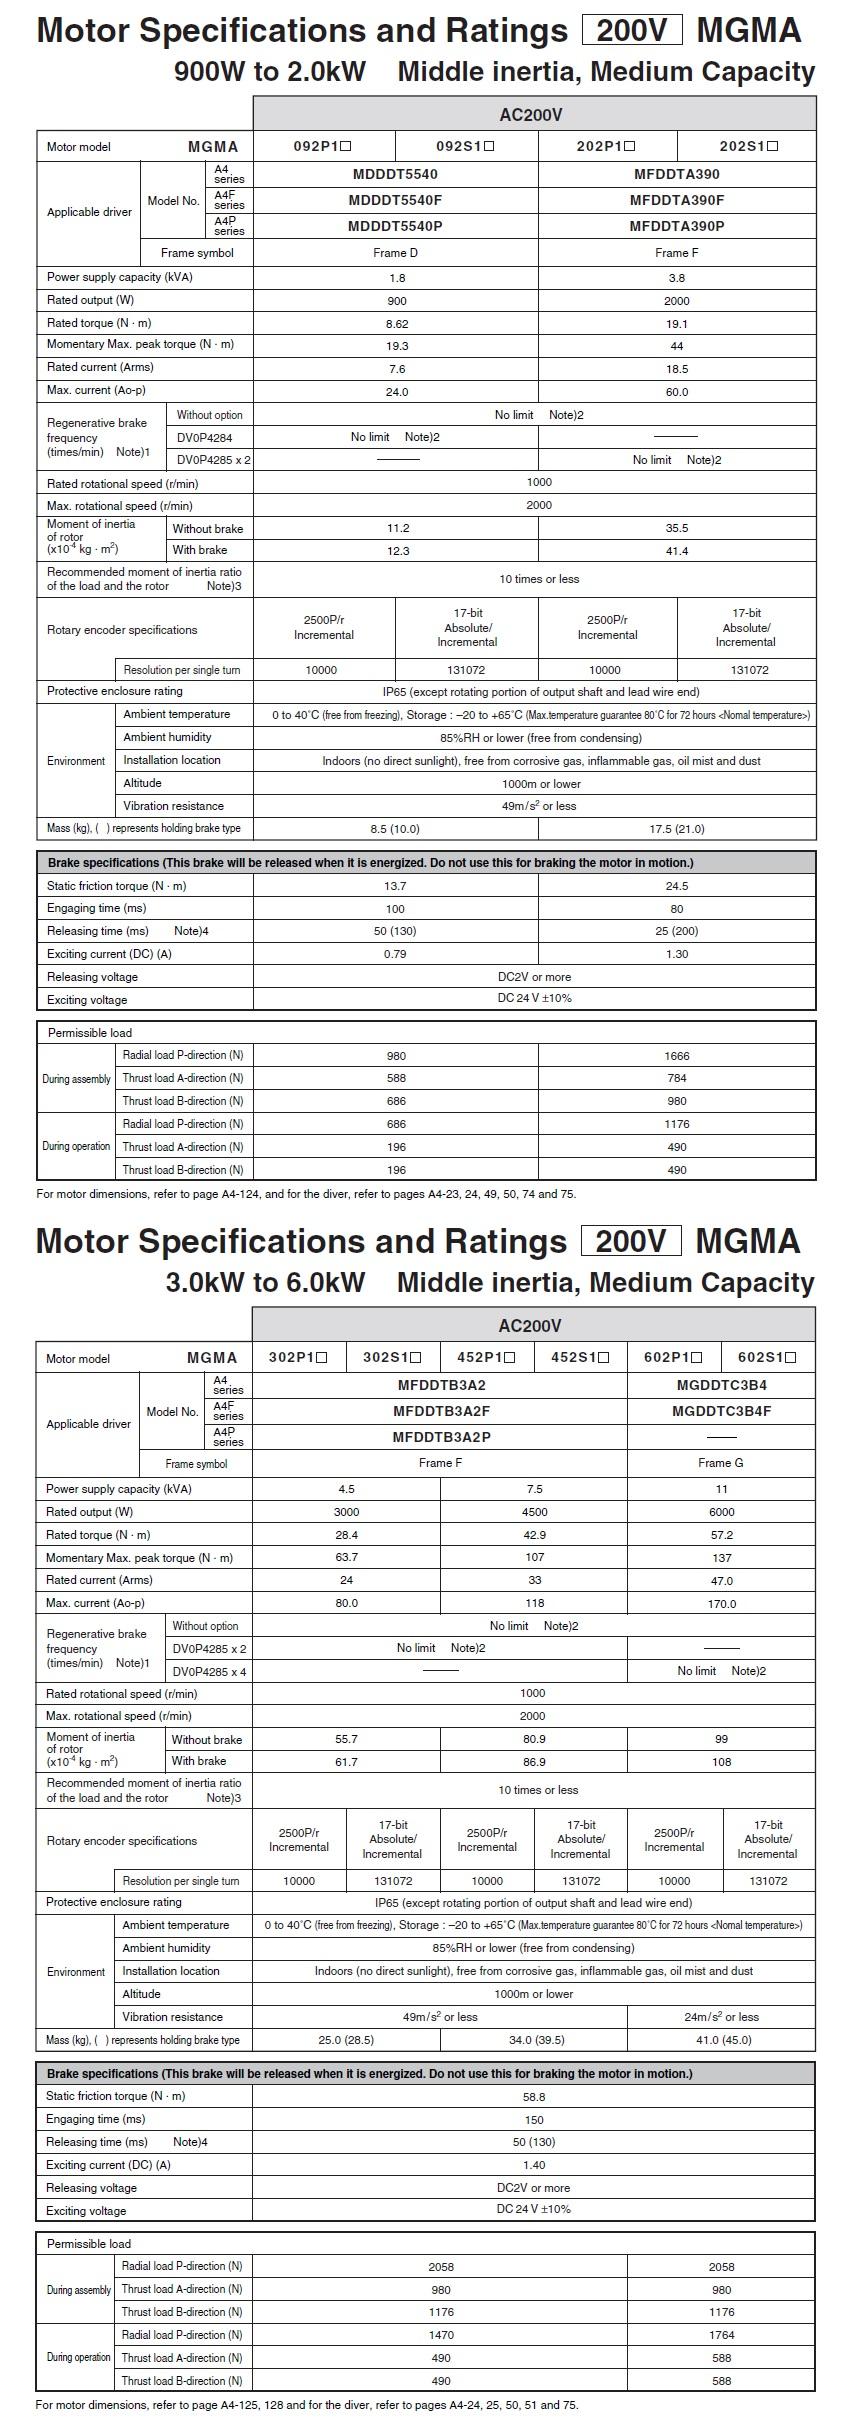 Panasonic: AC Servo Motors (MGMA A4 Series)